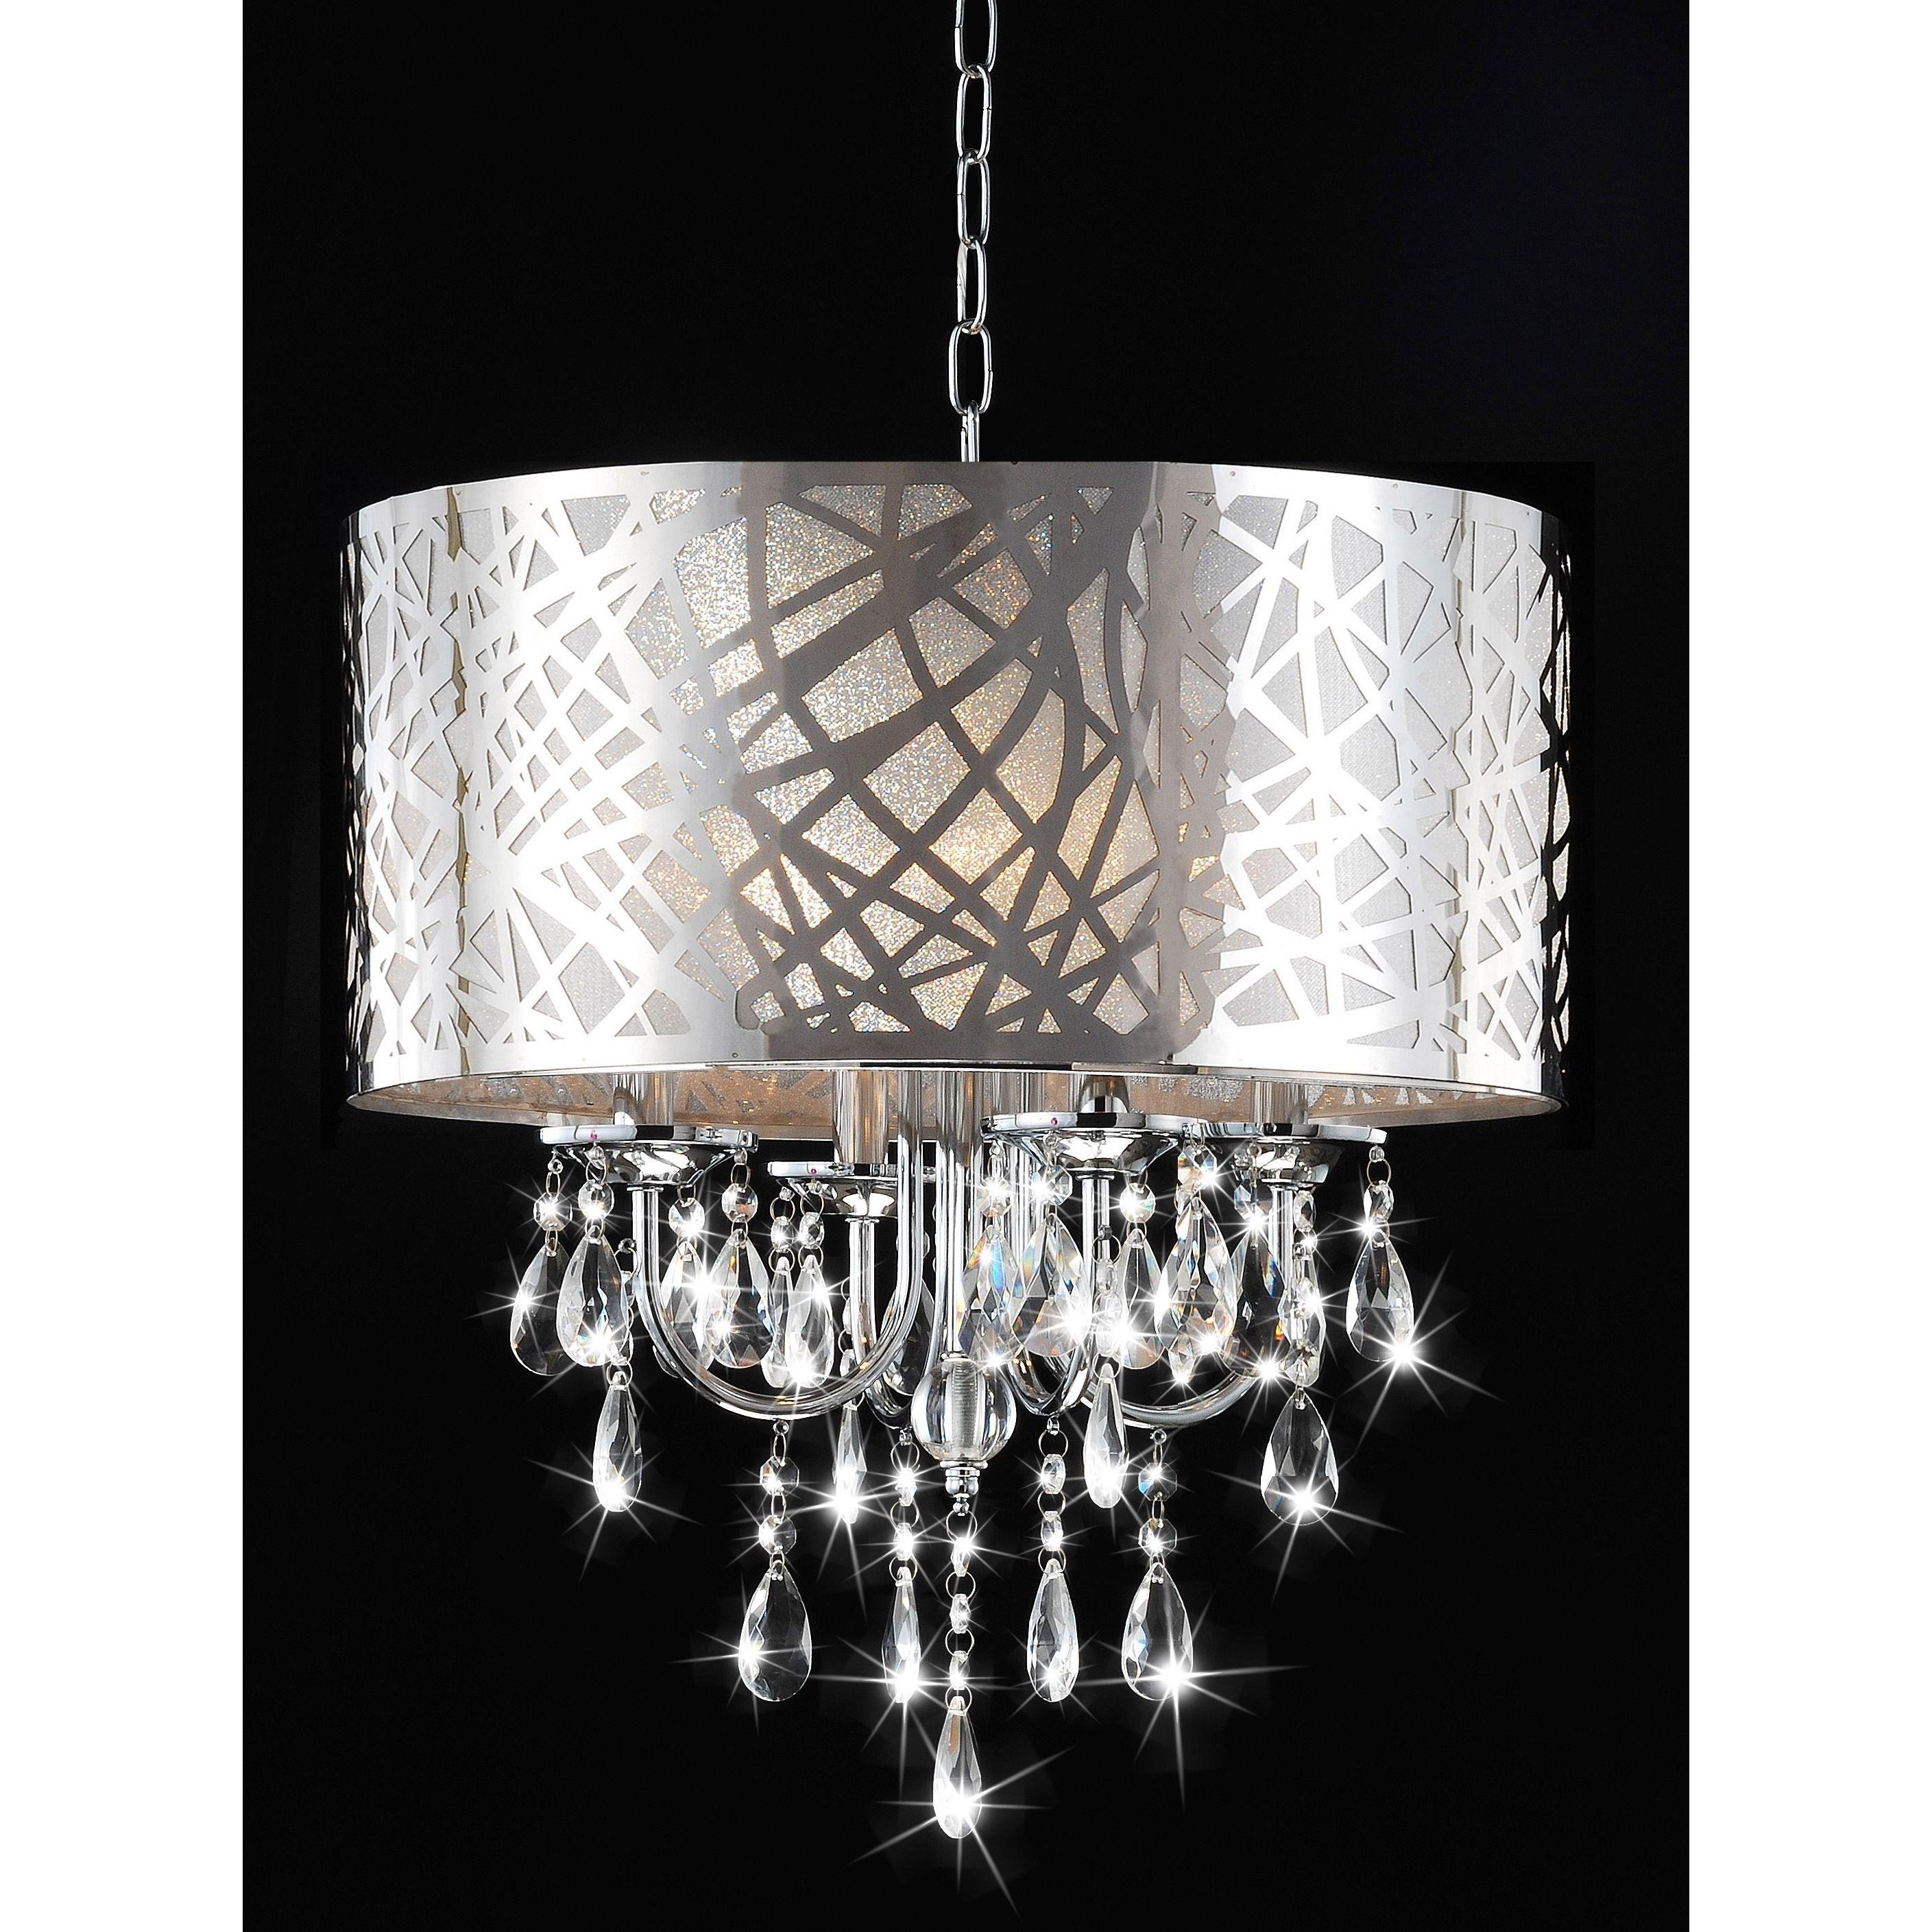 4 light Chrome Crystal Chandelier Silver